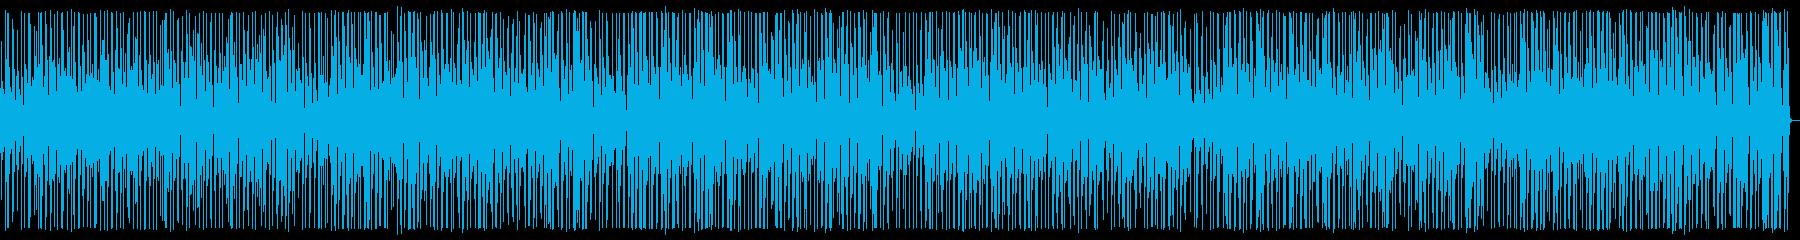 YouTube アコギ・カホン・日常の再生済みの波形